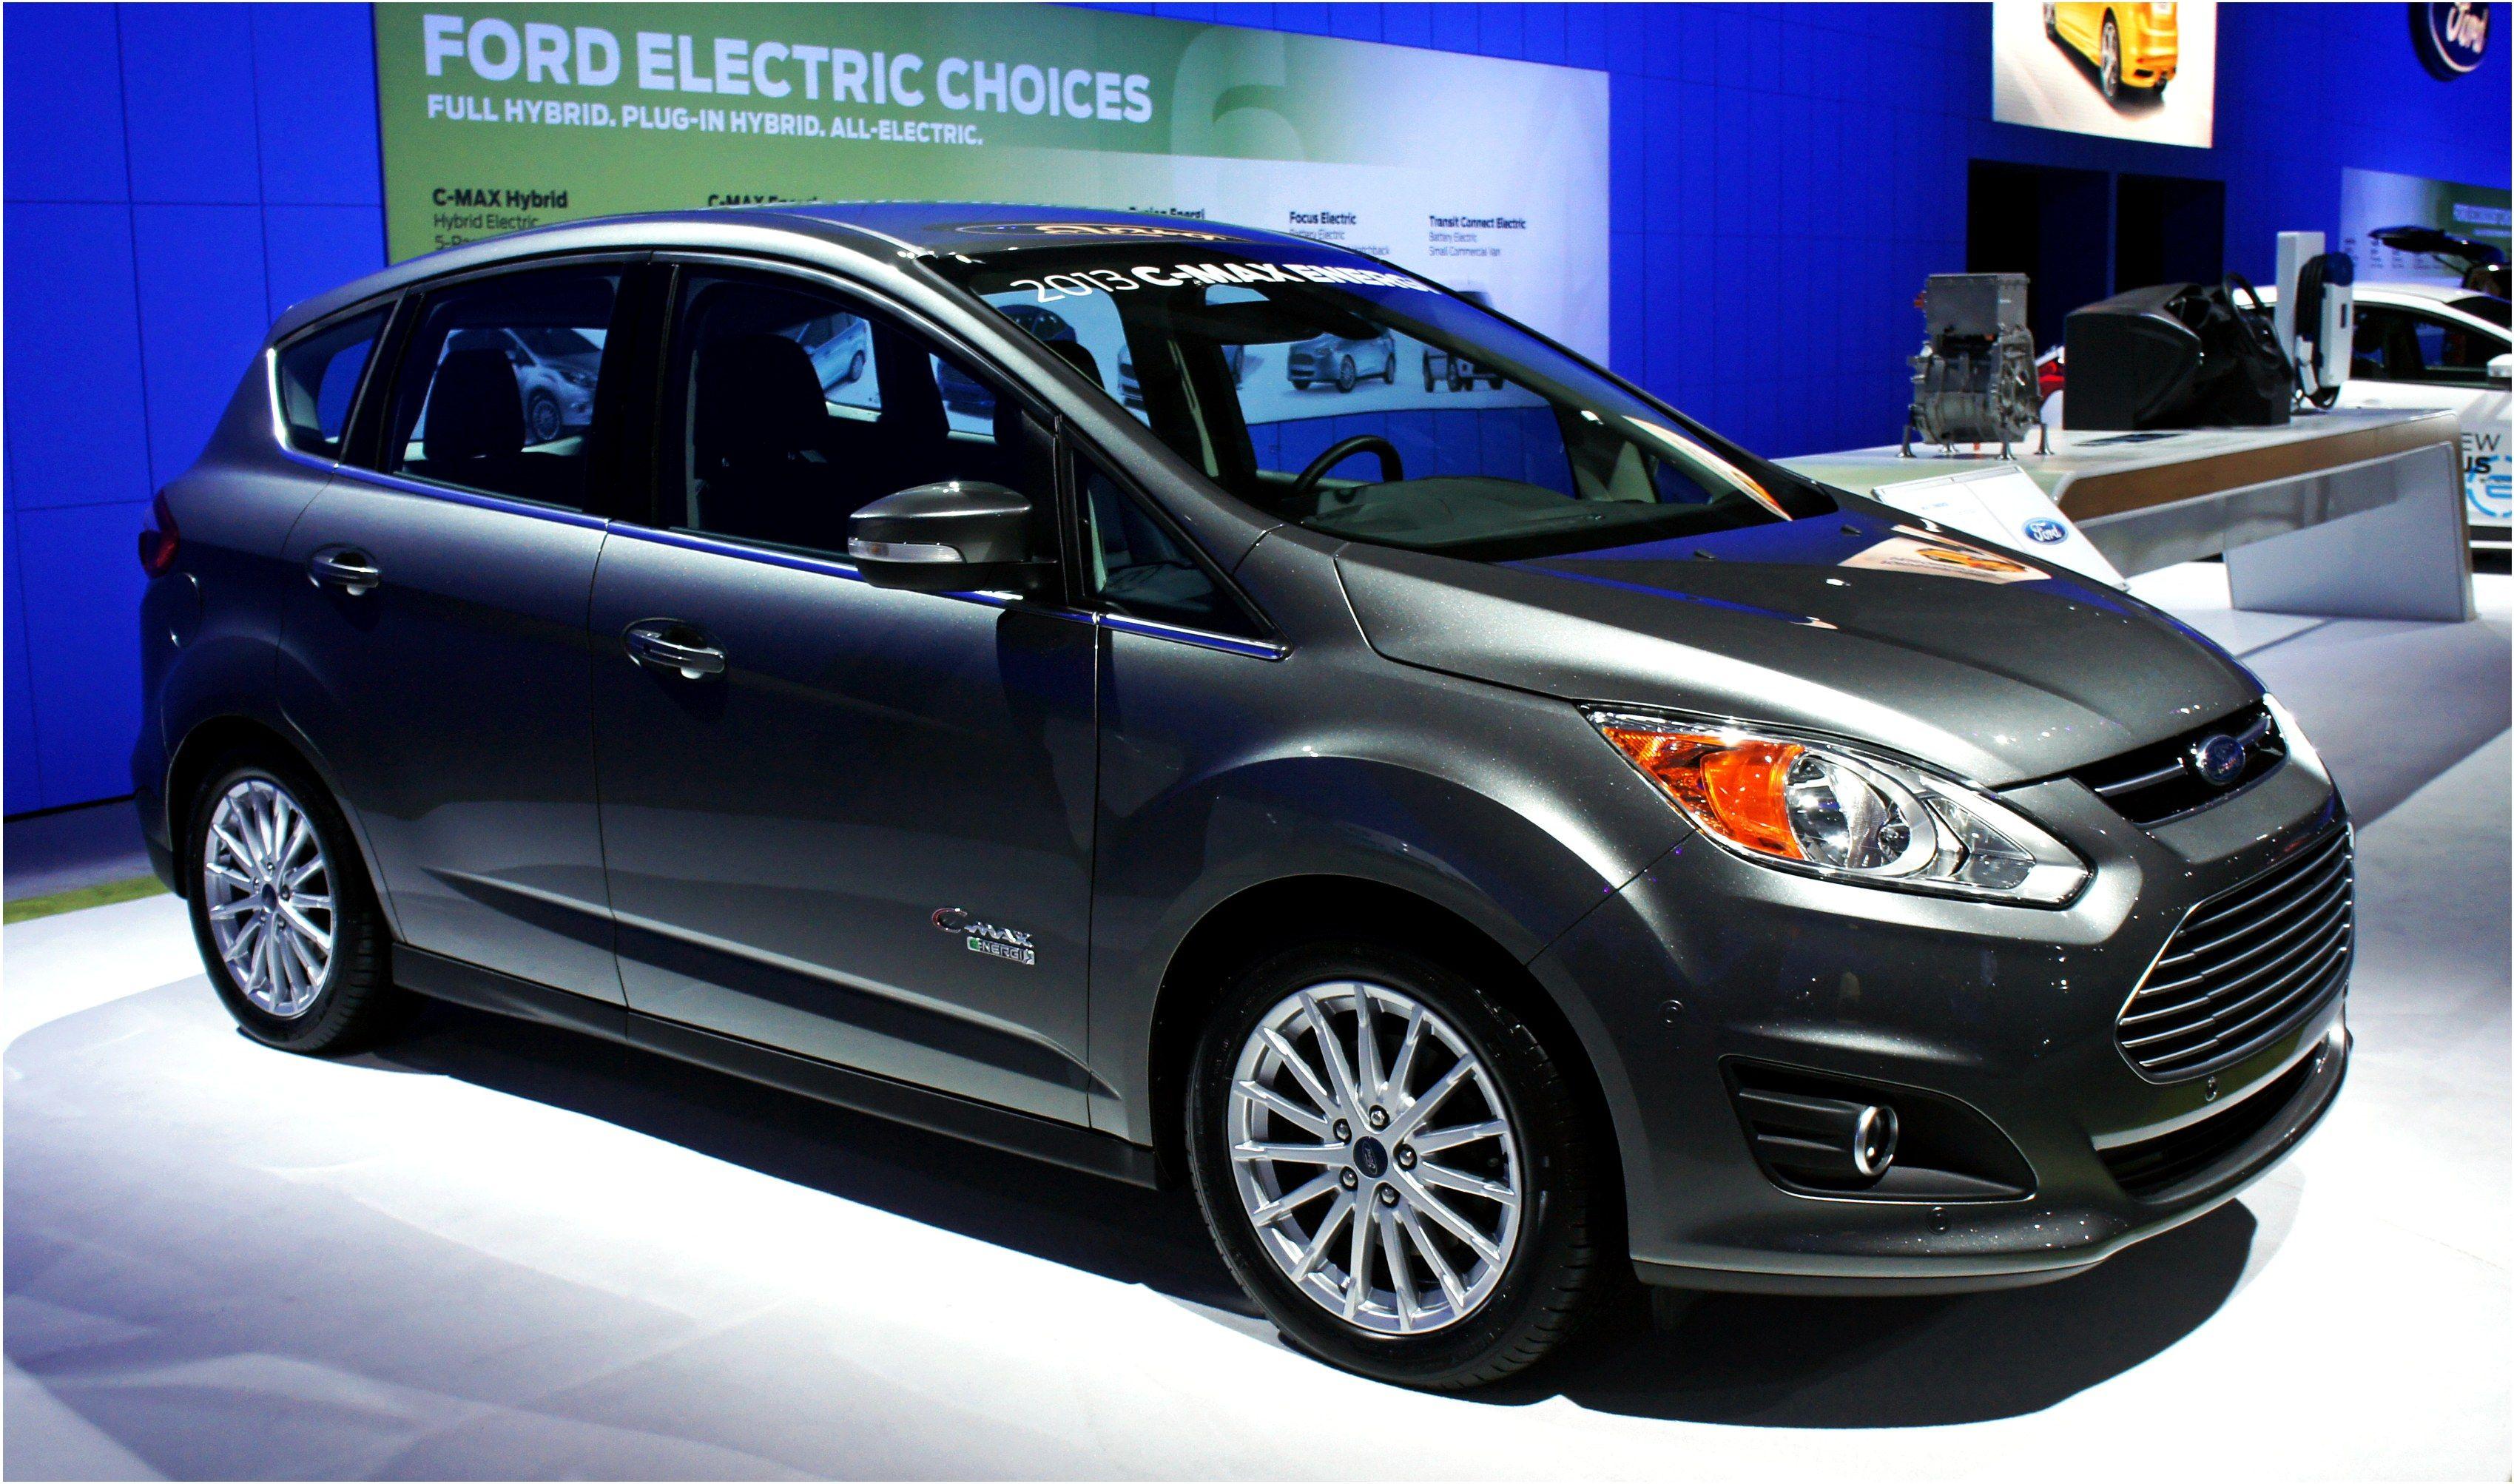 2015 Ford C Max Hybrid Design And Performance Hybrid Car Ford C